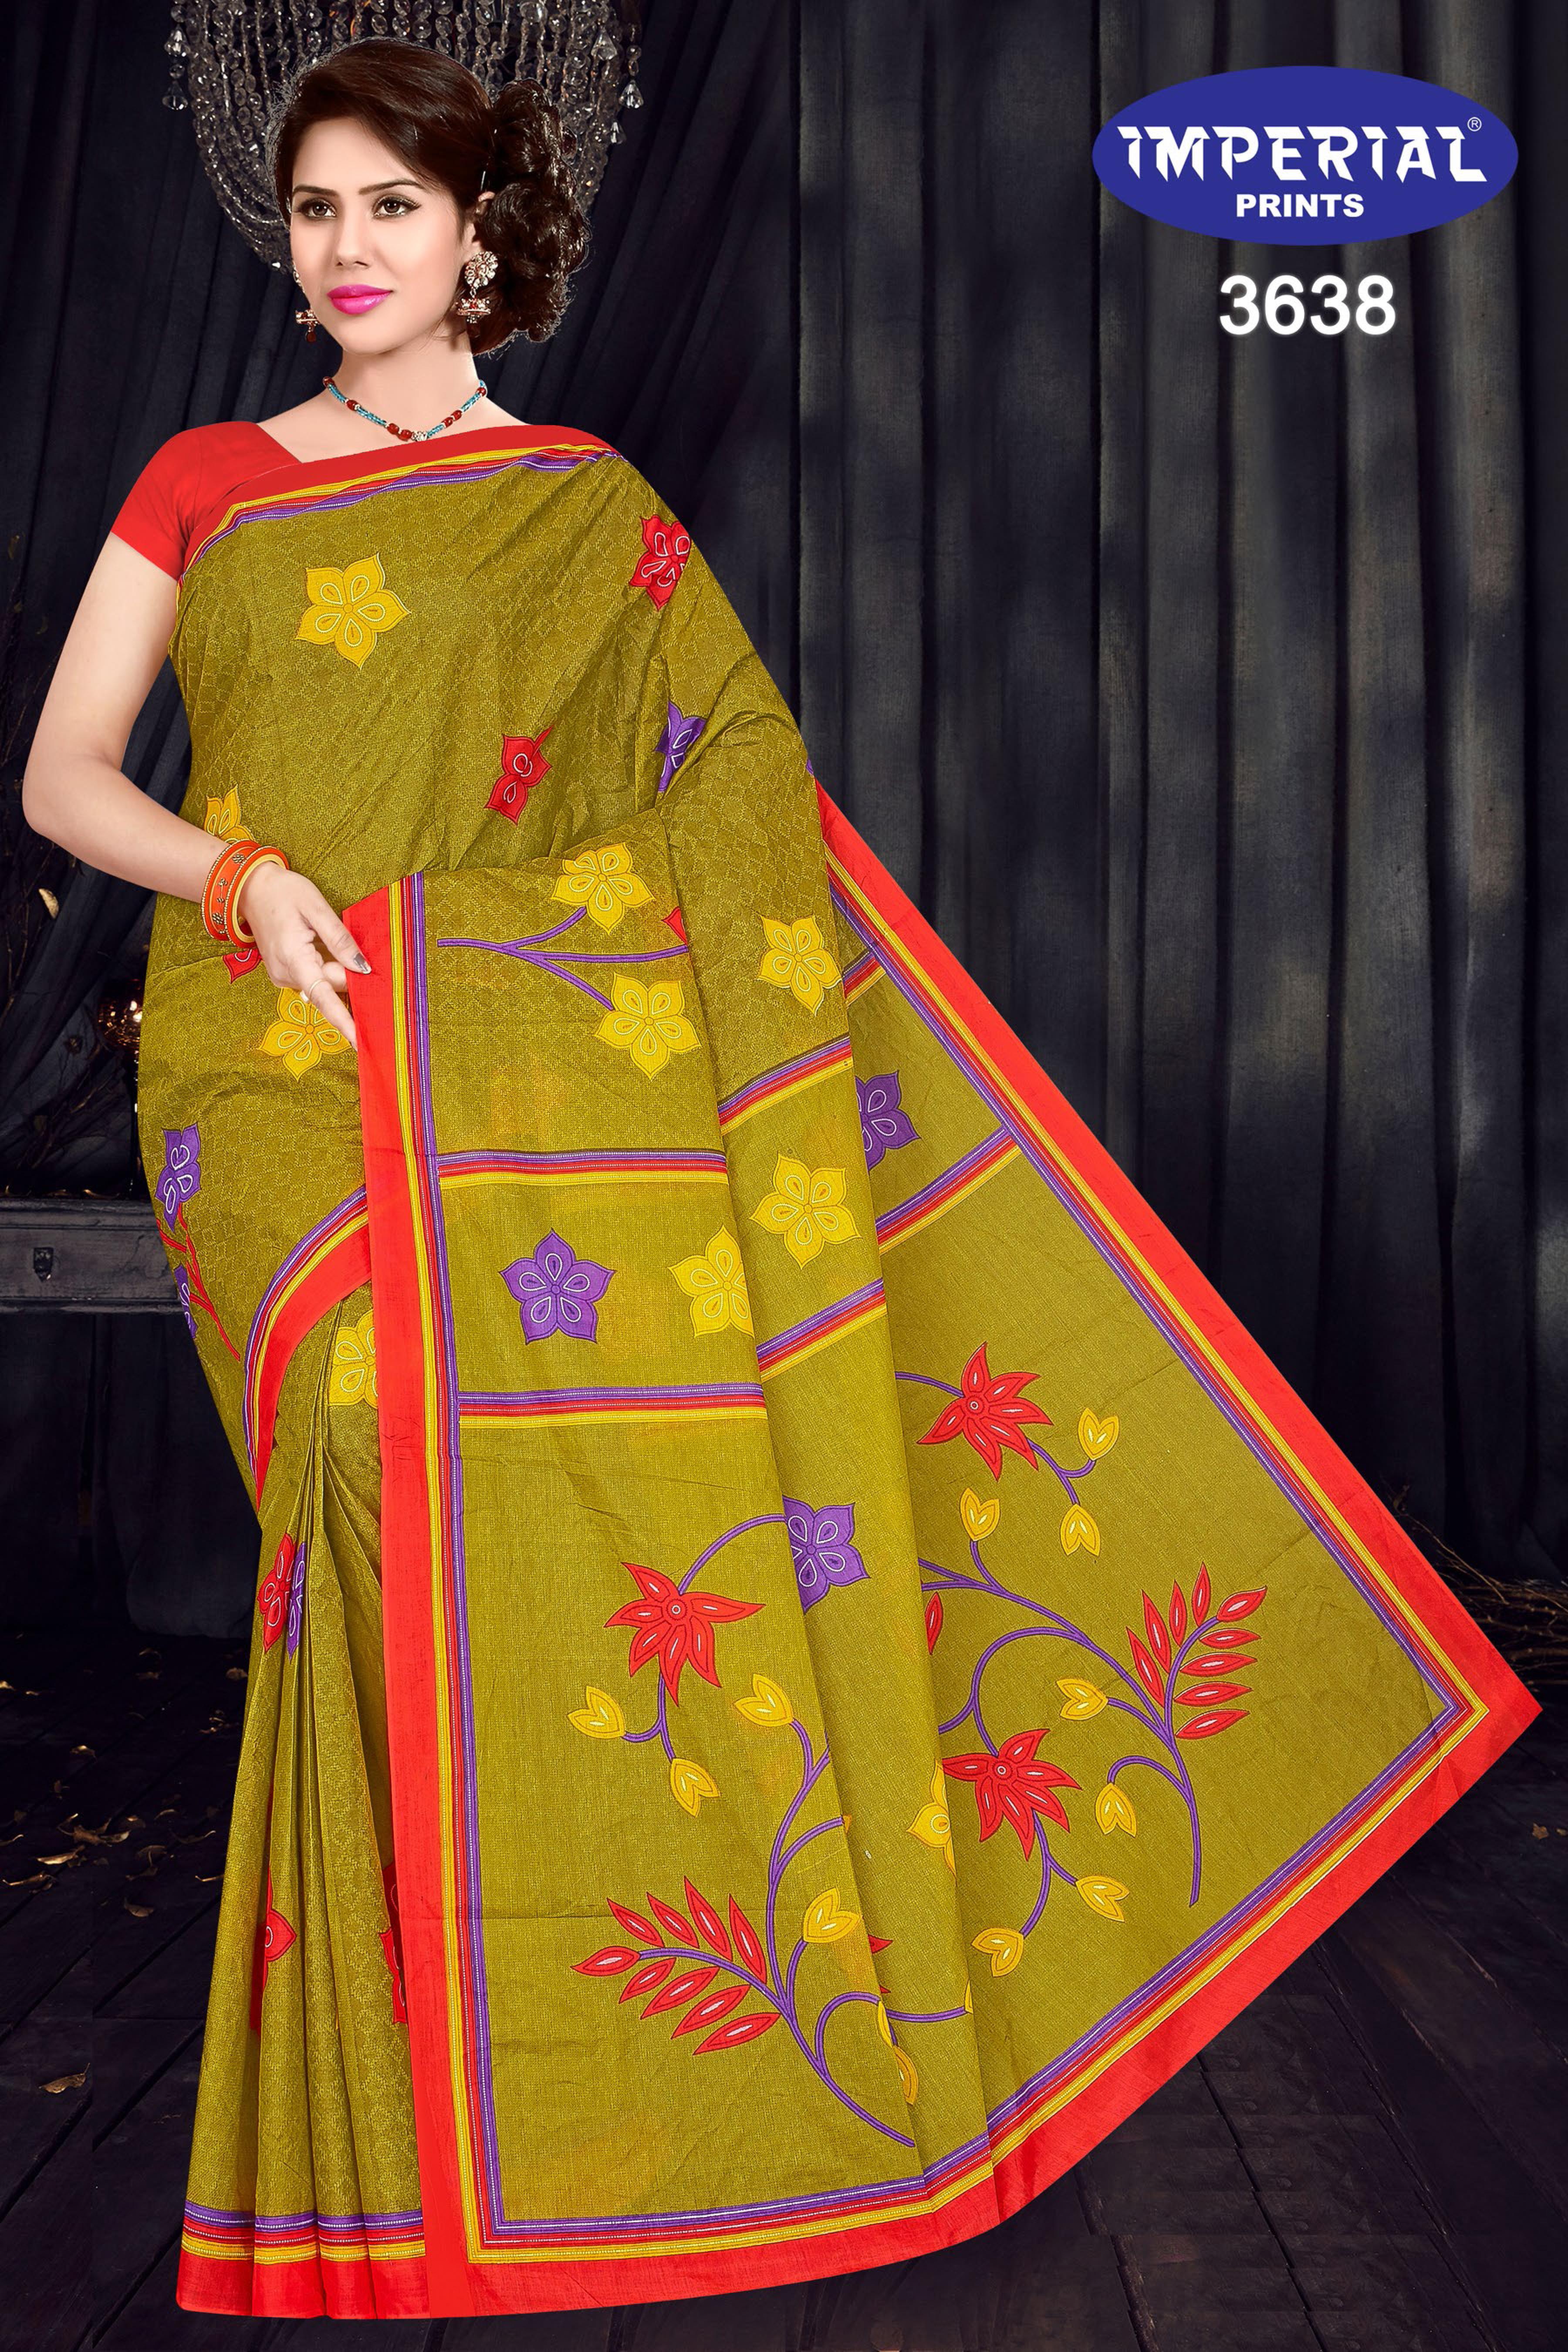 Imperial Mari Gold Saree Sari Wholesale Catalog 15 Pcs 9 - Imperial Mari Gold Saree Sari Wholesale Catalog 15 Pcs